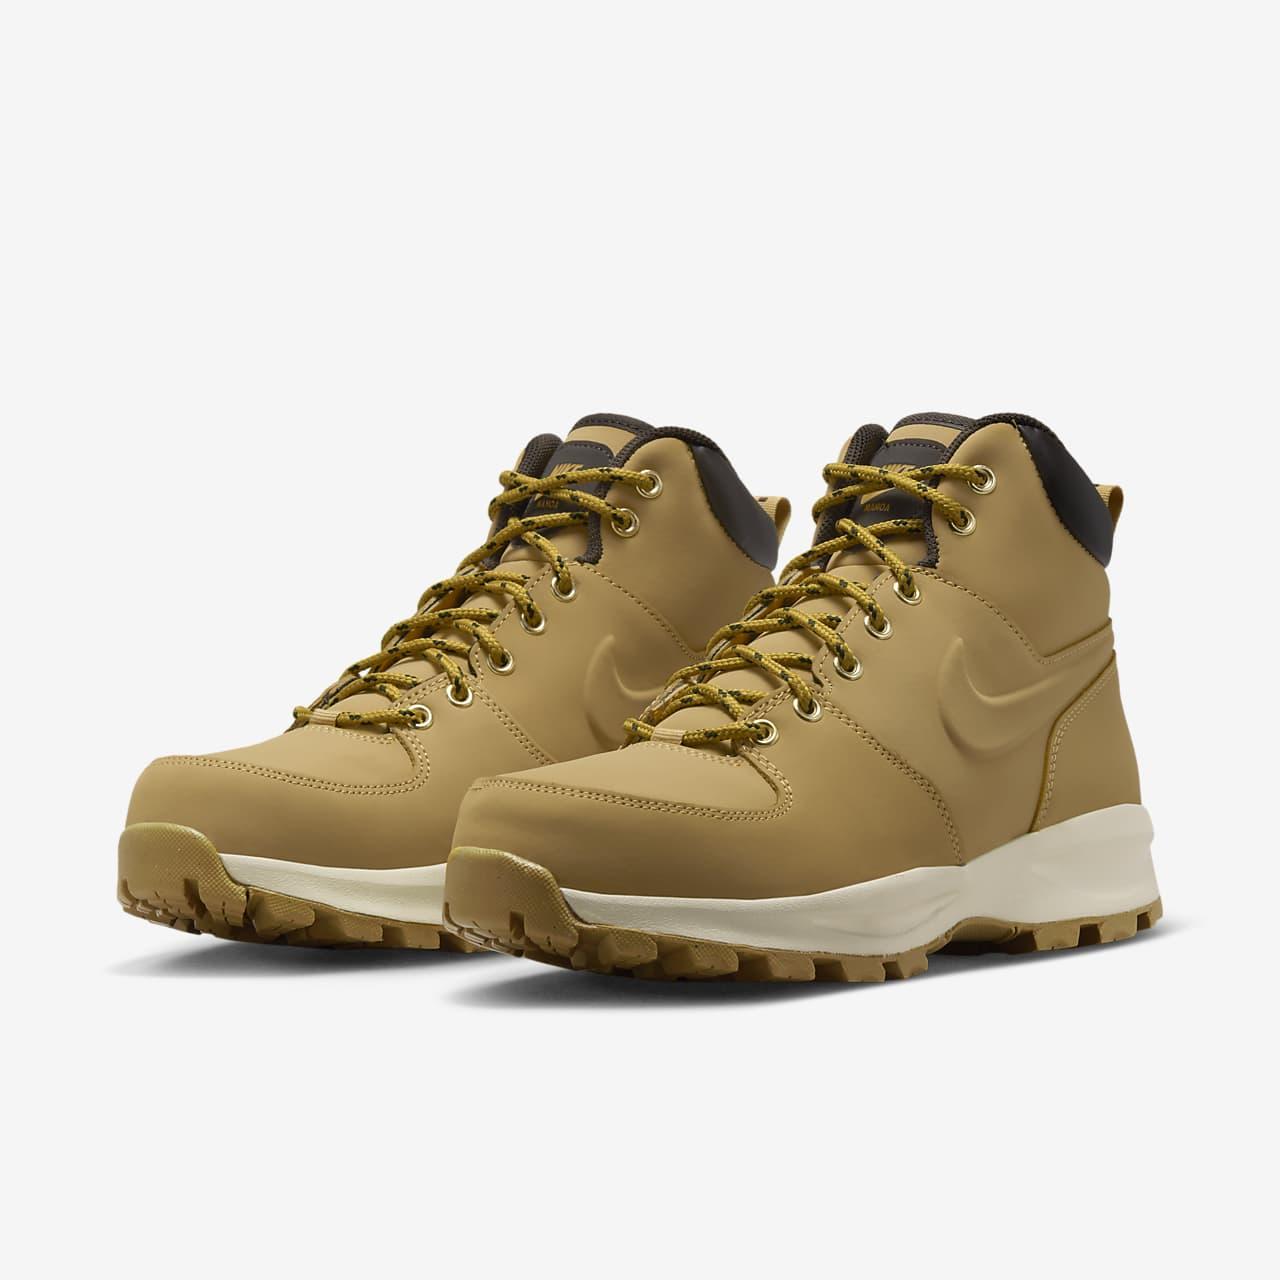 ba23b52388 Low Resolution Nike Manoa Herrenschuh Nike Manoa Herrenschuh